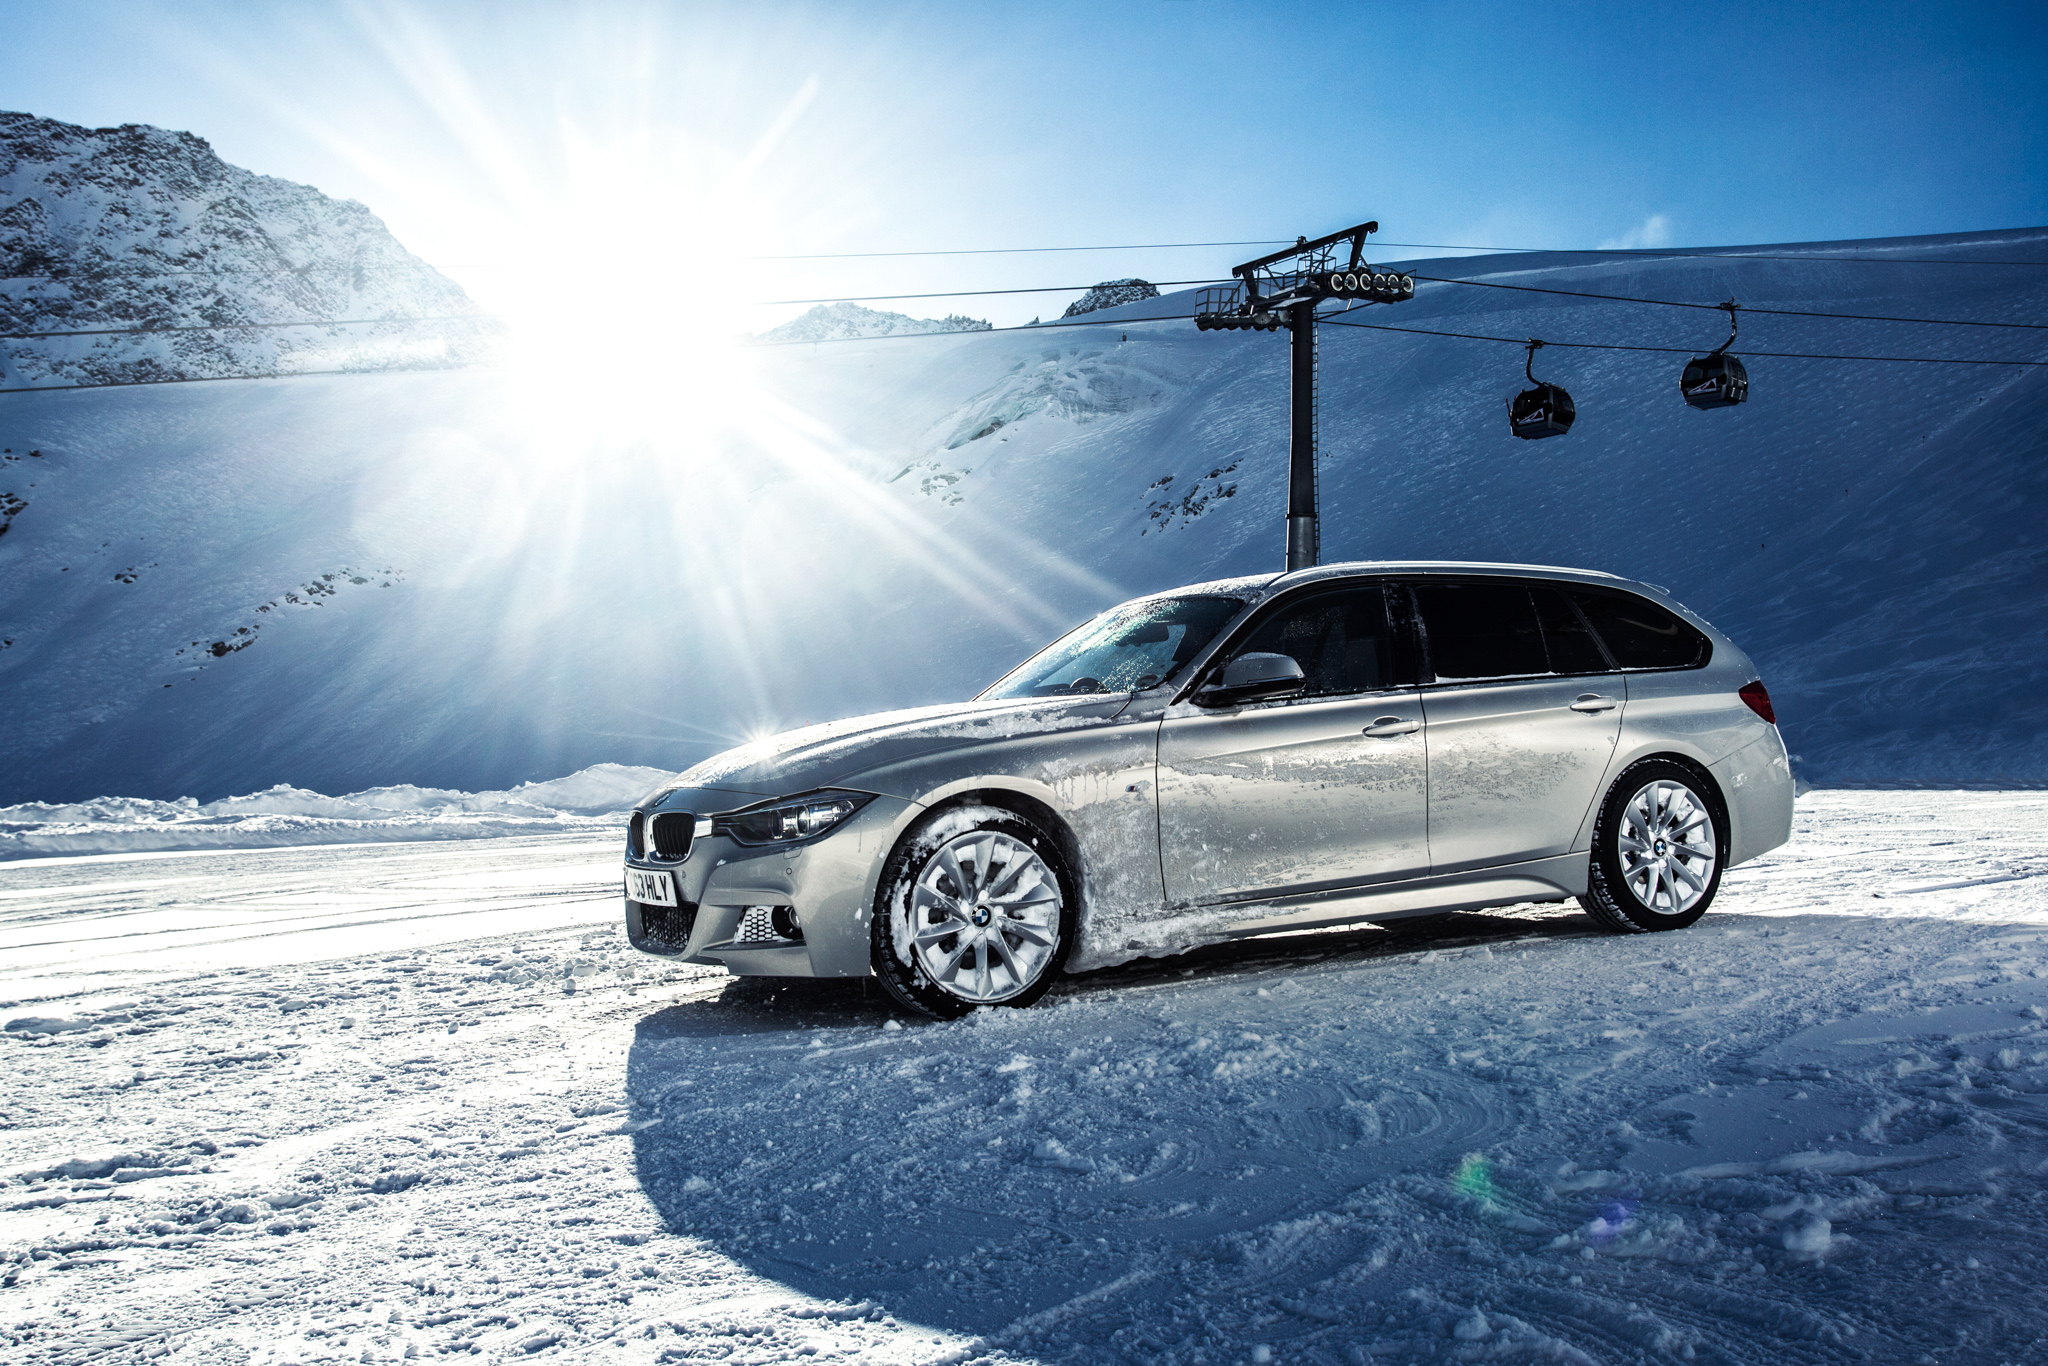 BMW Vs Winter